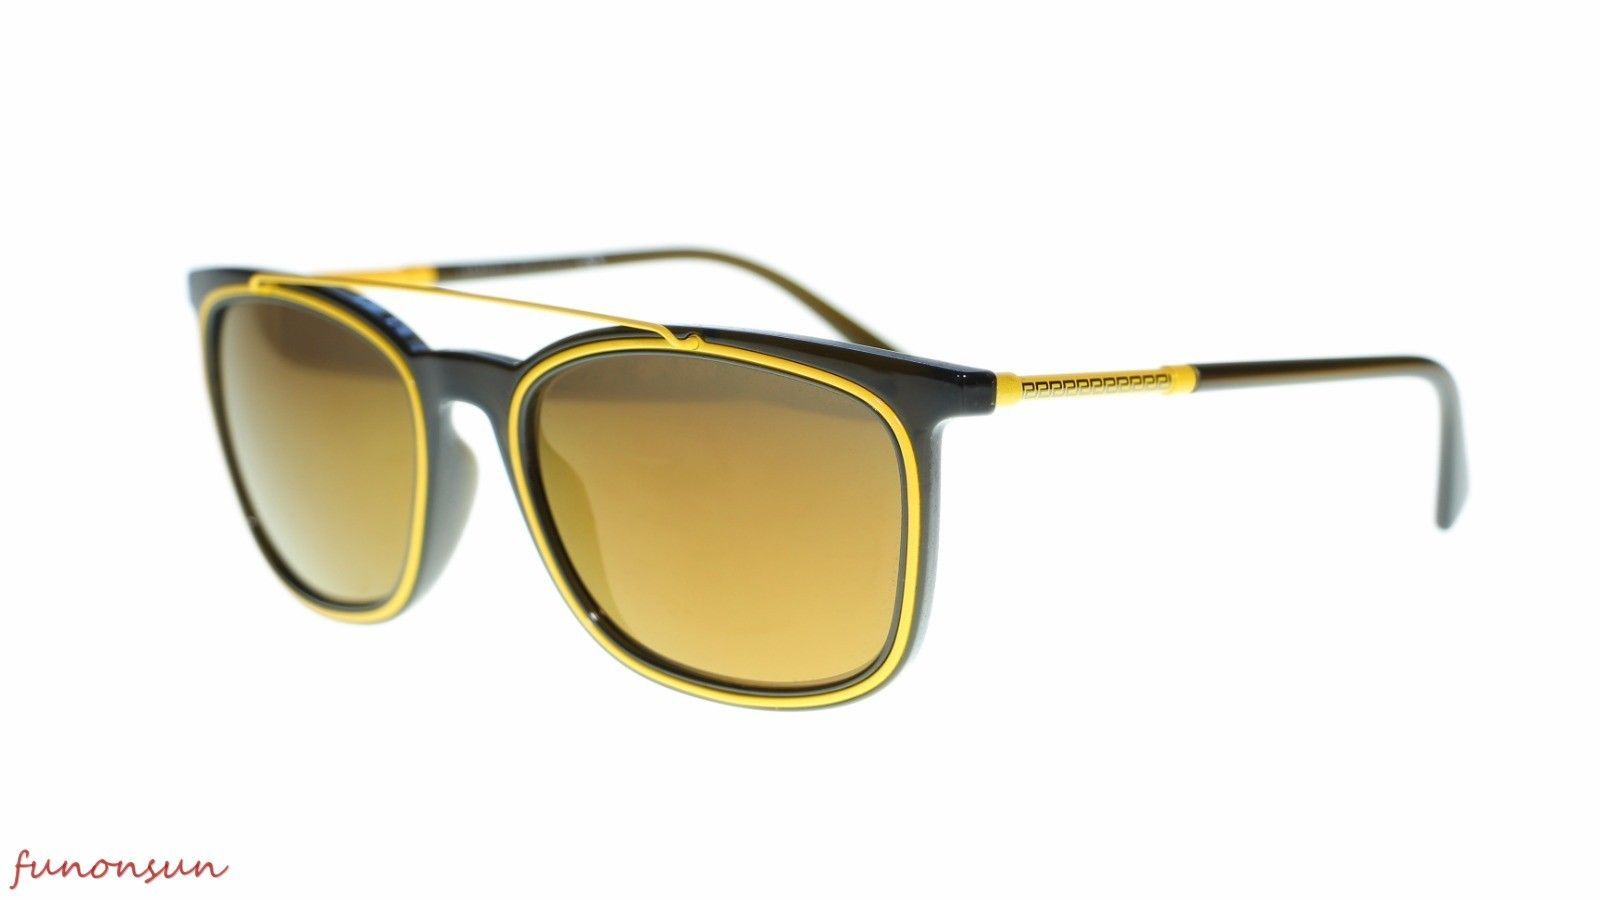 66086d75c39 Versace Men s Square Sunglasses VE4335 and 50 similar items. 10